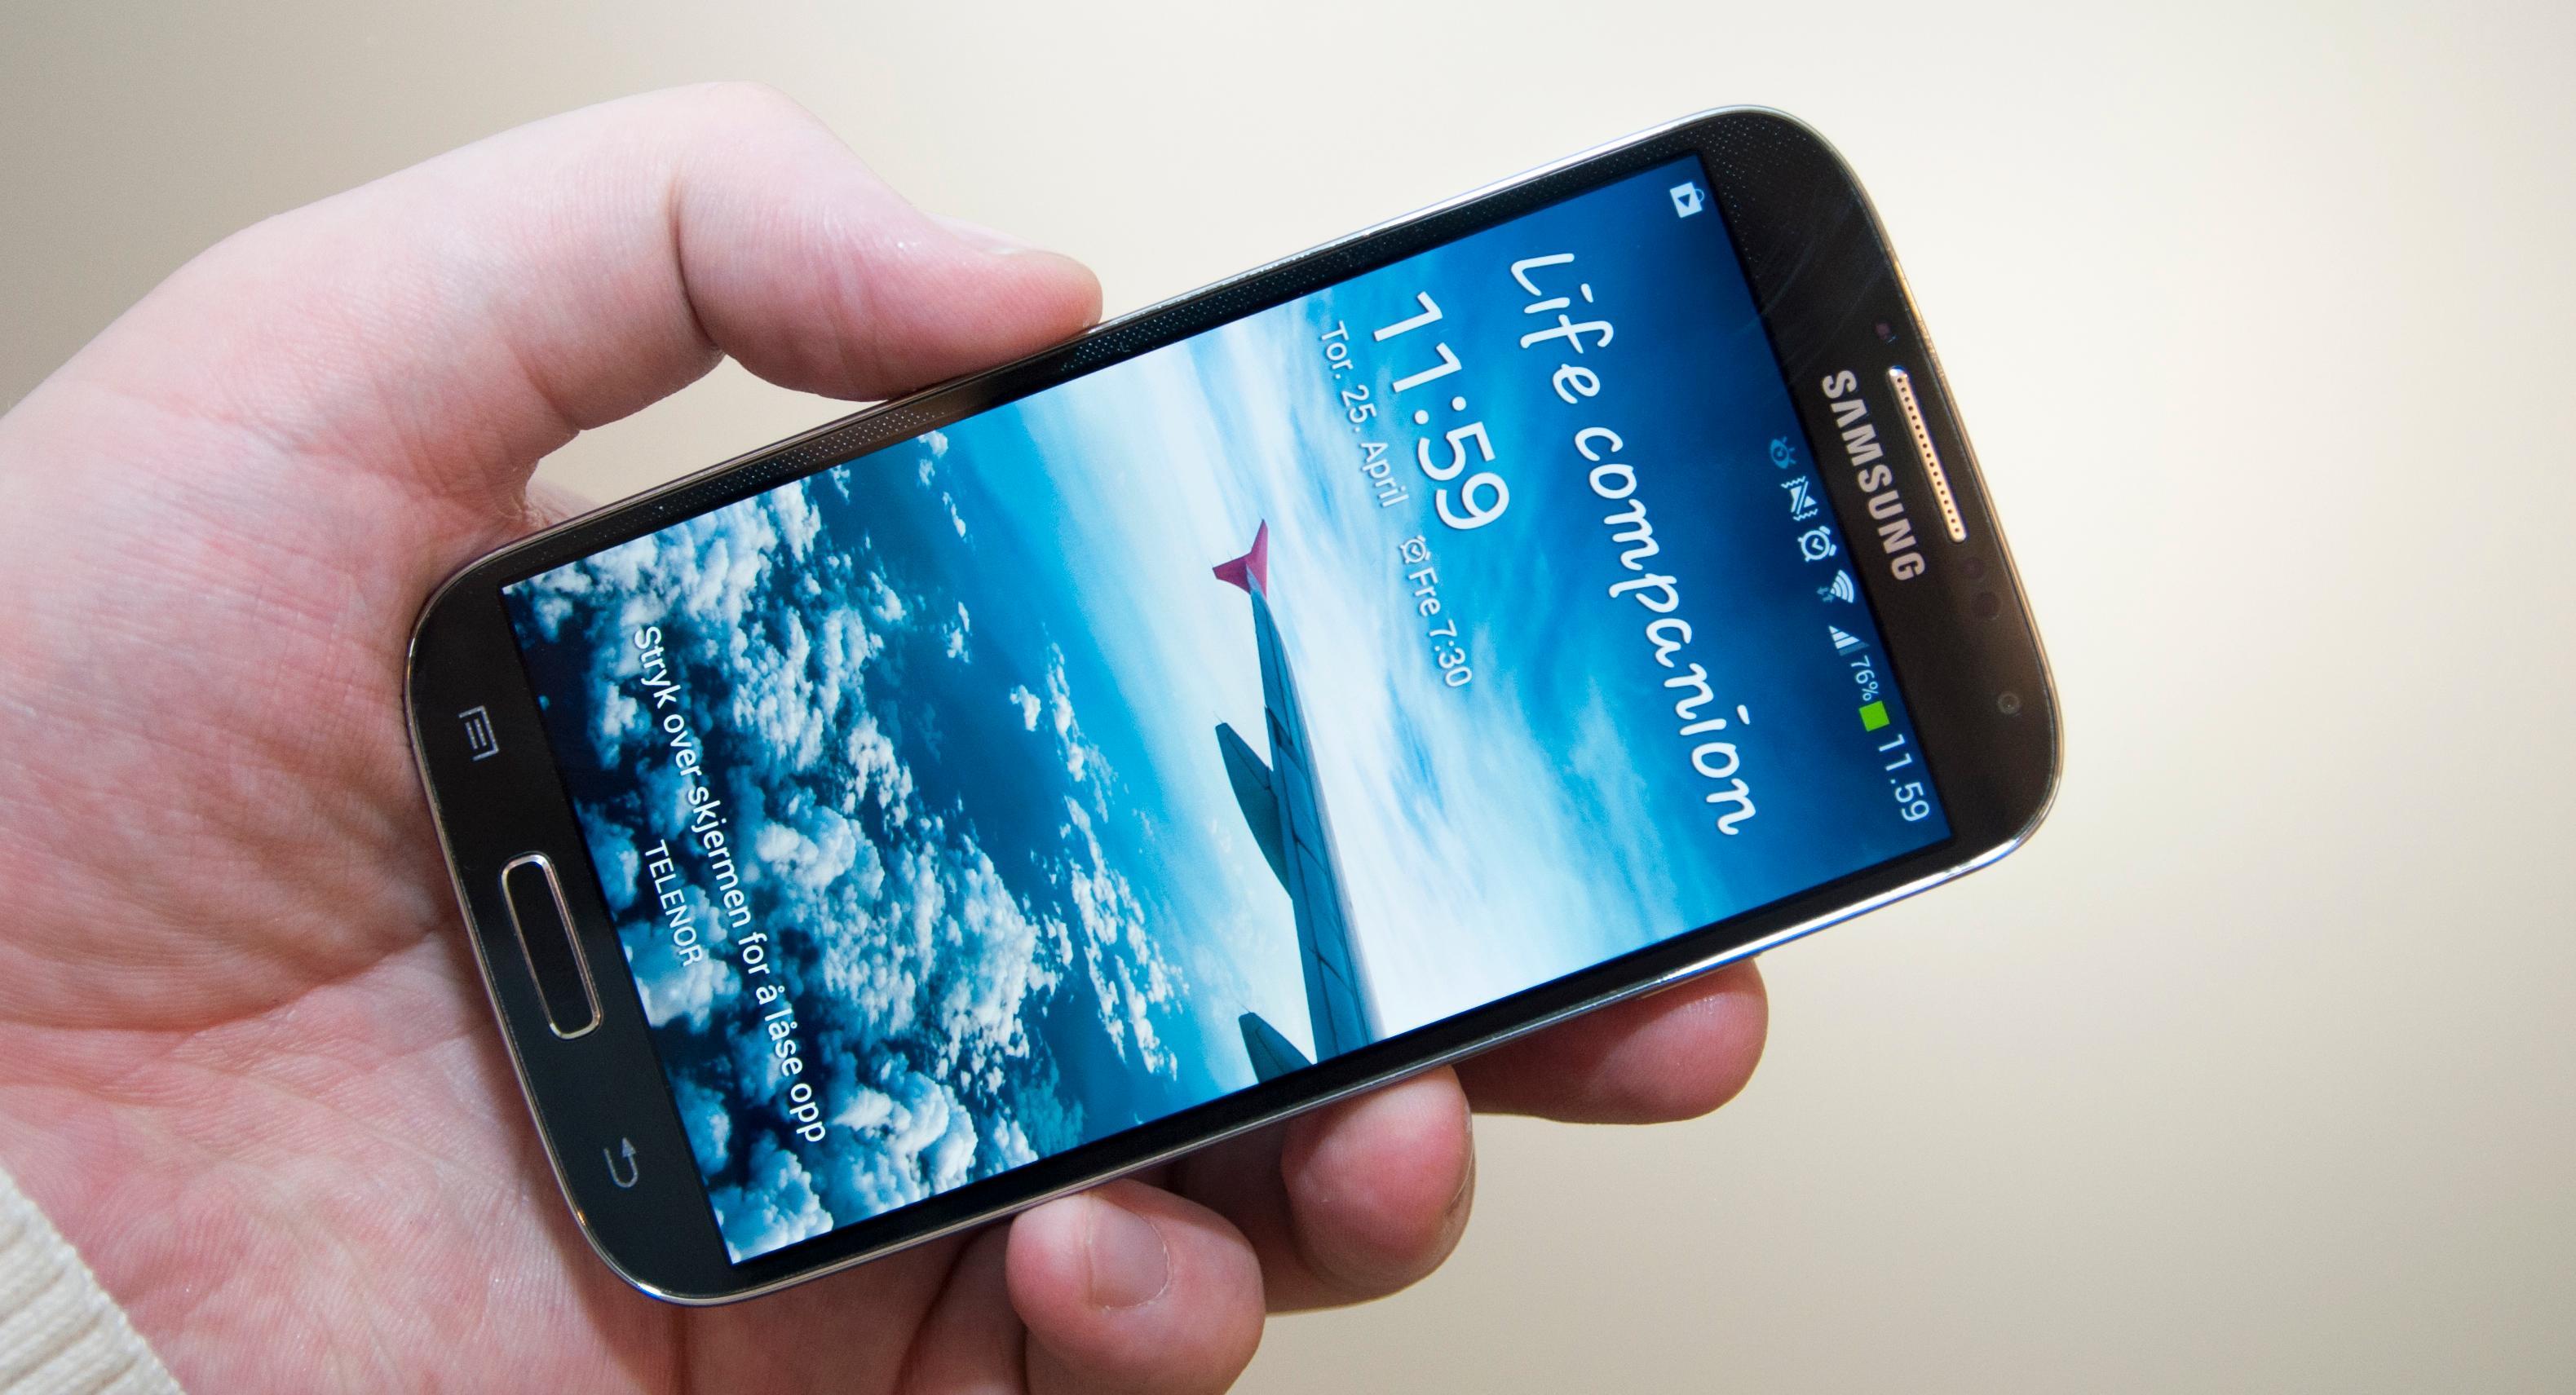 Samsung Galaxy S4.Foto: Finn Jarle Kvalheim, Mobilen.no